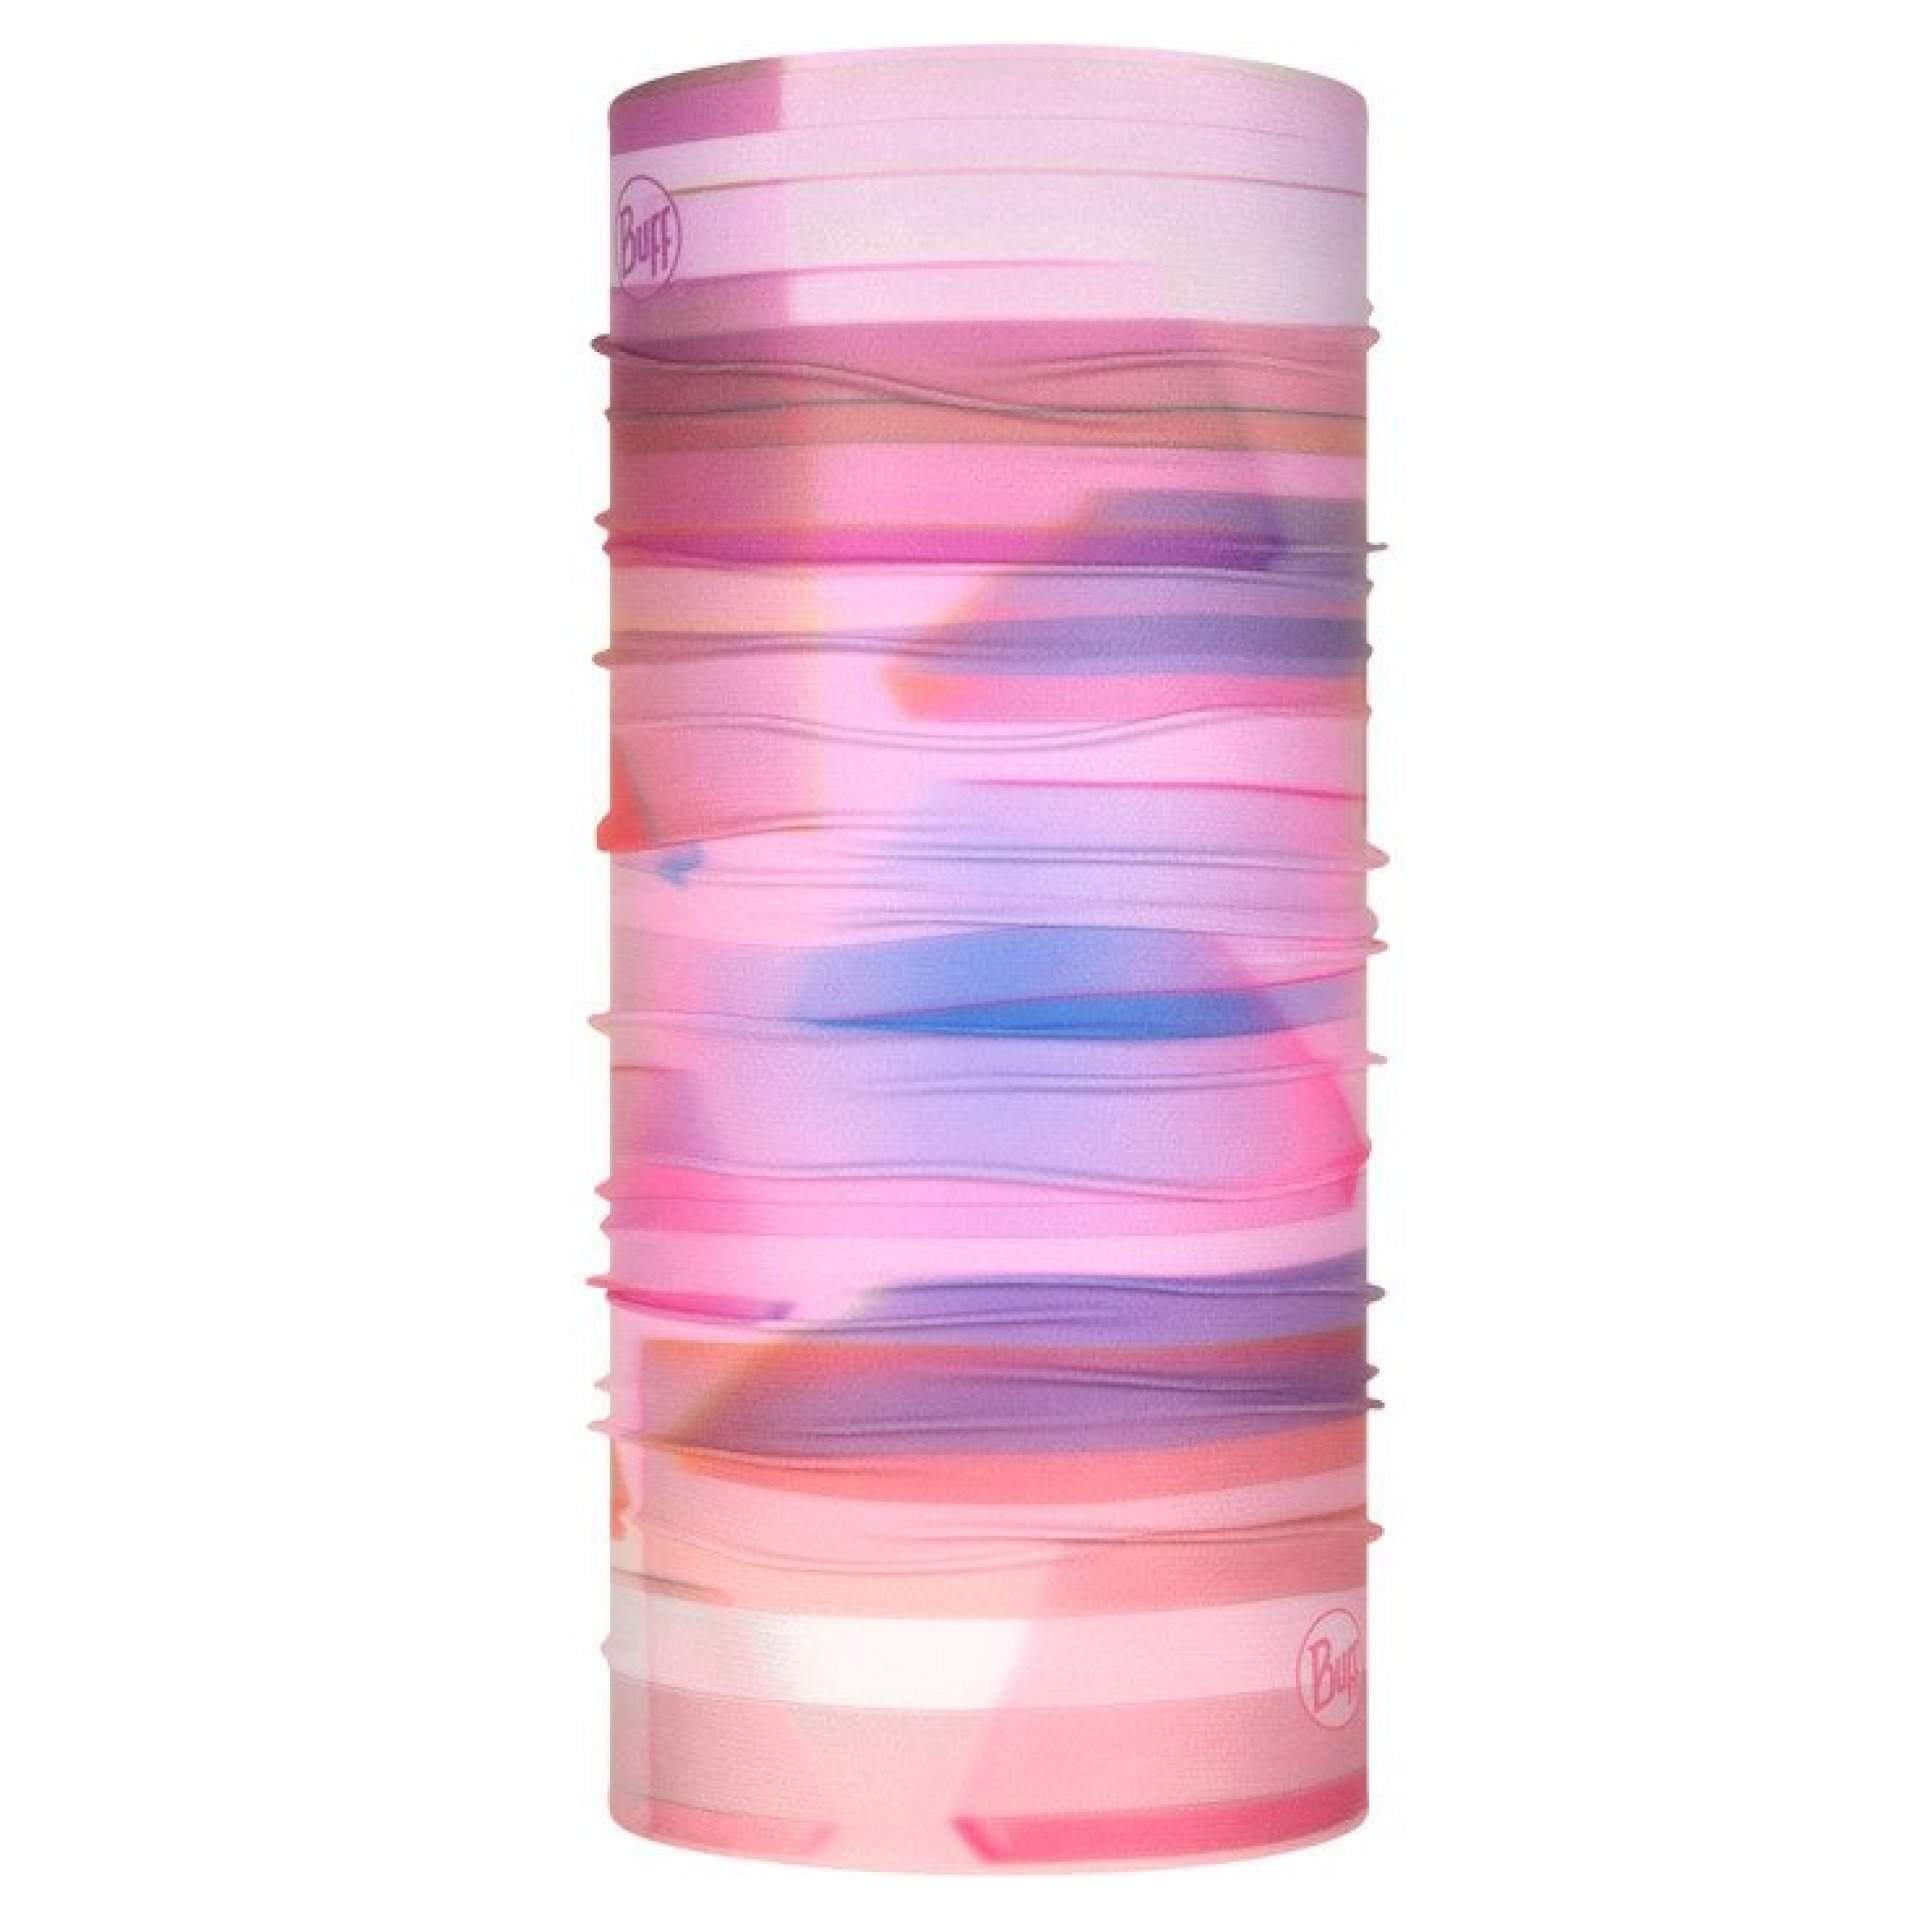 CHUSTA BUFF COOLNET UV+ NE10 PALE PINK